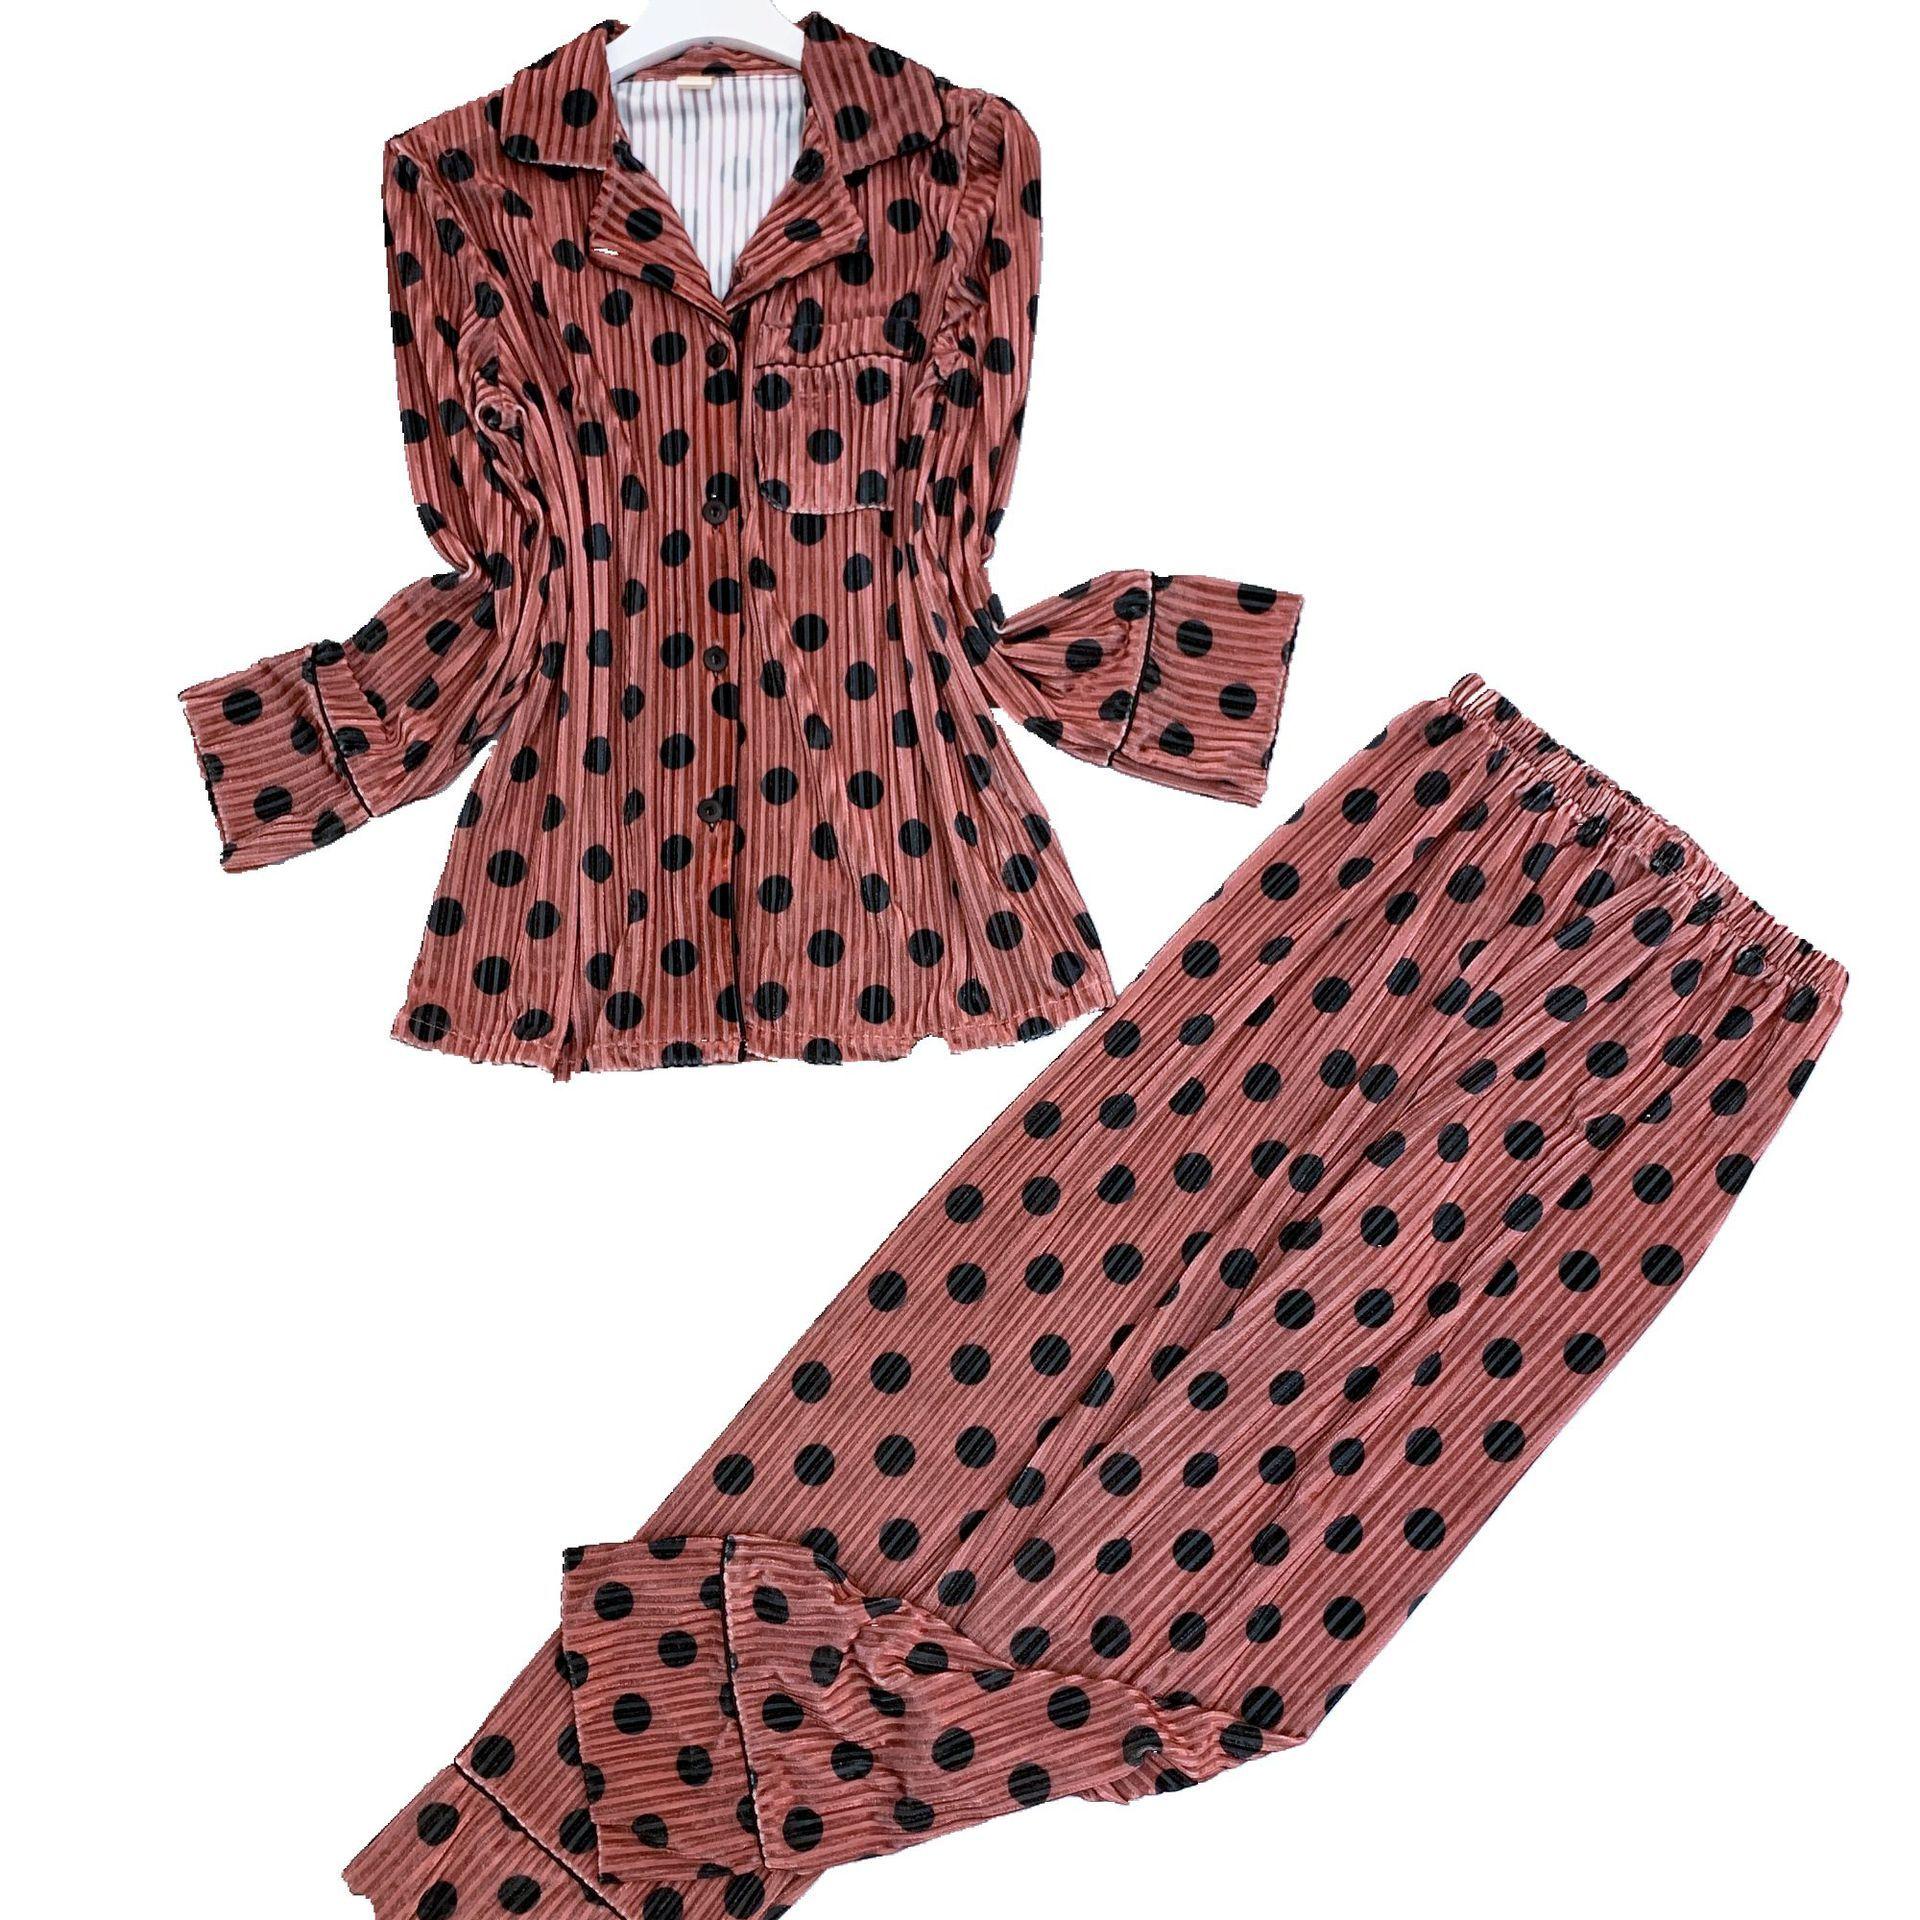 Lisacmvpnel Autumn Gold Velvet Women Pajama Set Polka Dot Long Sleeve Thicken Sleepwear